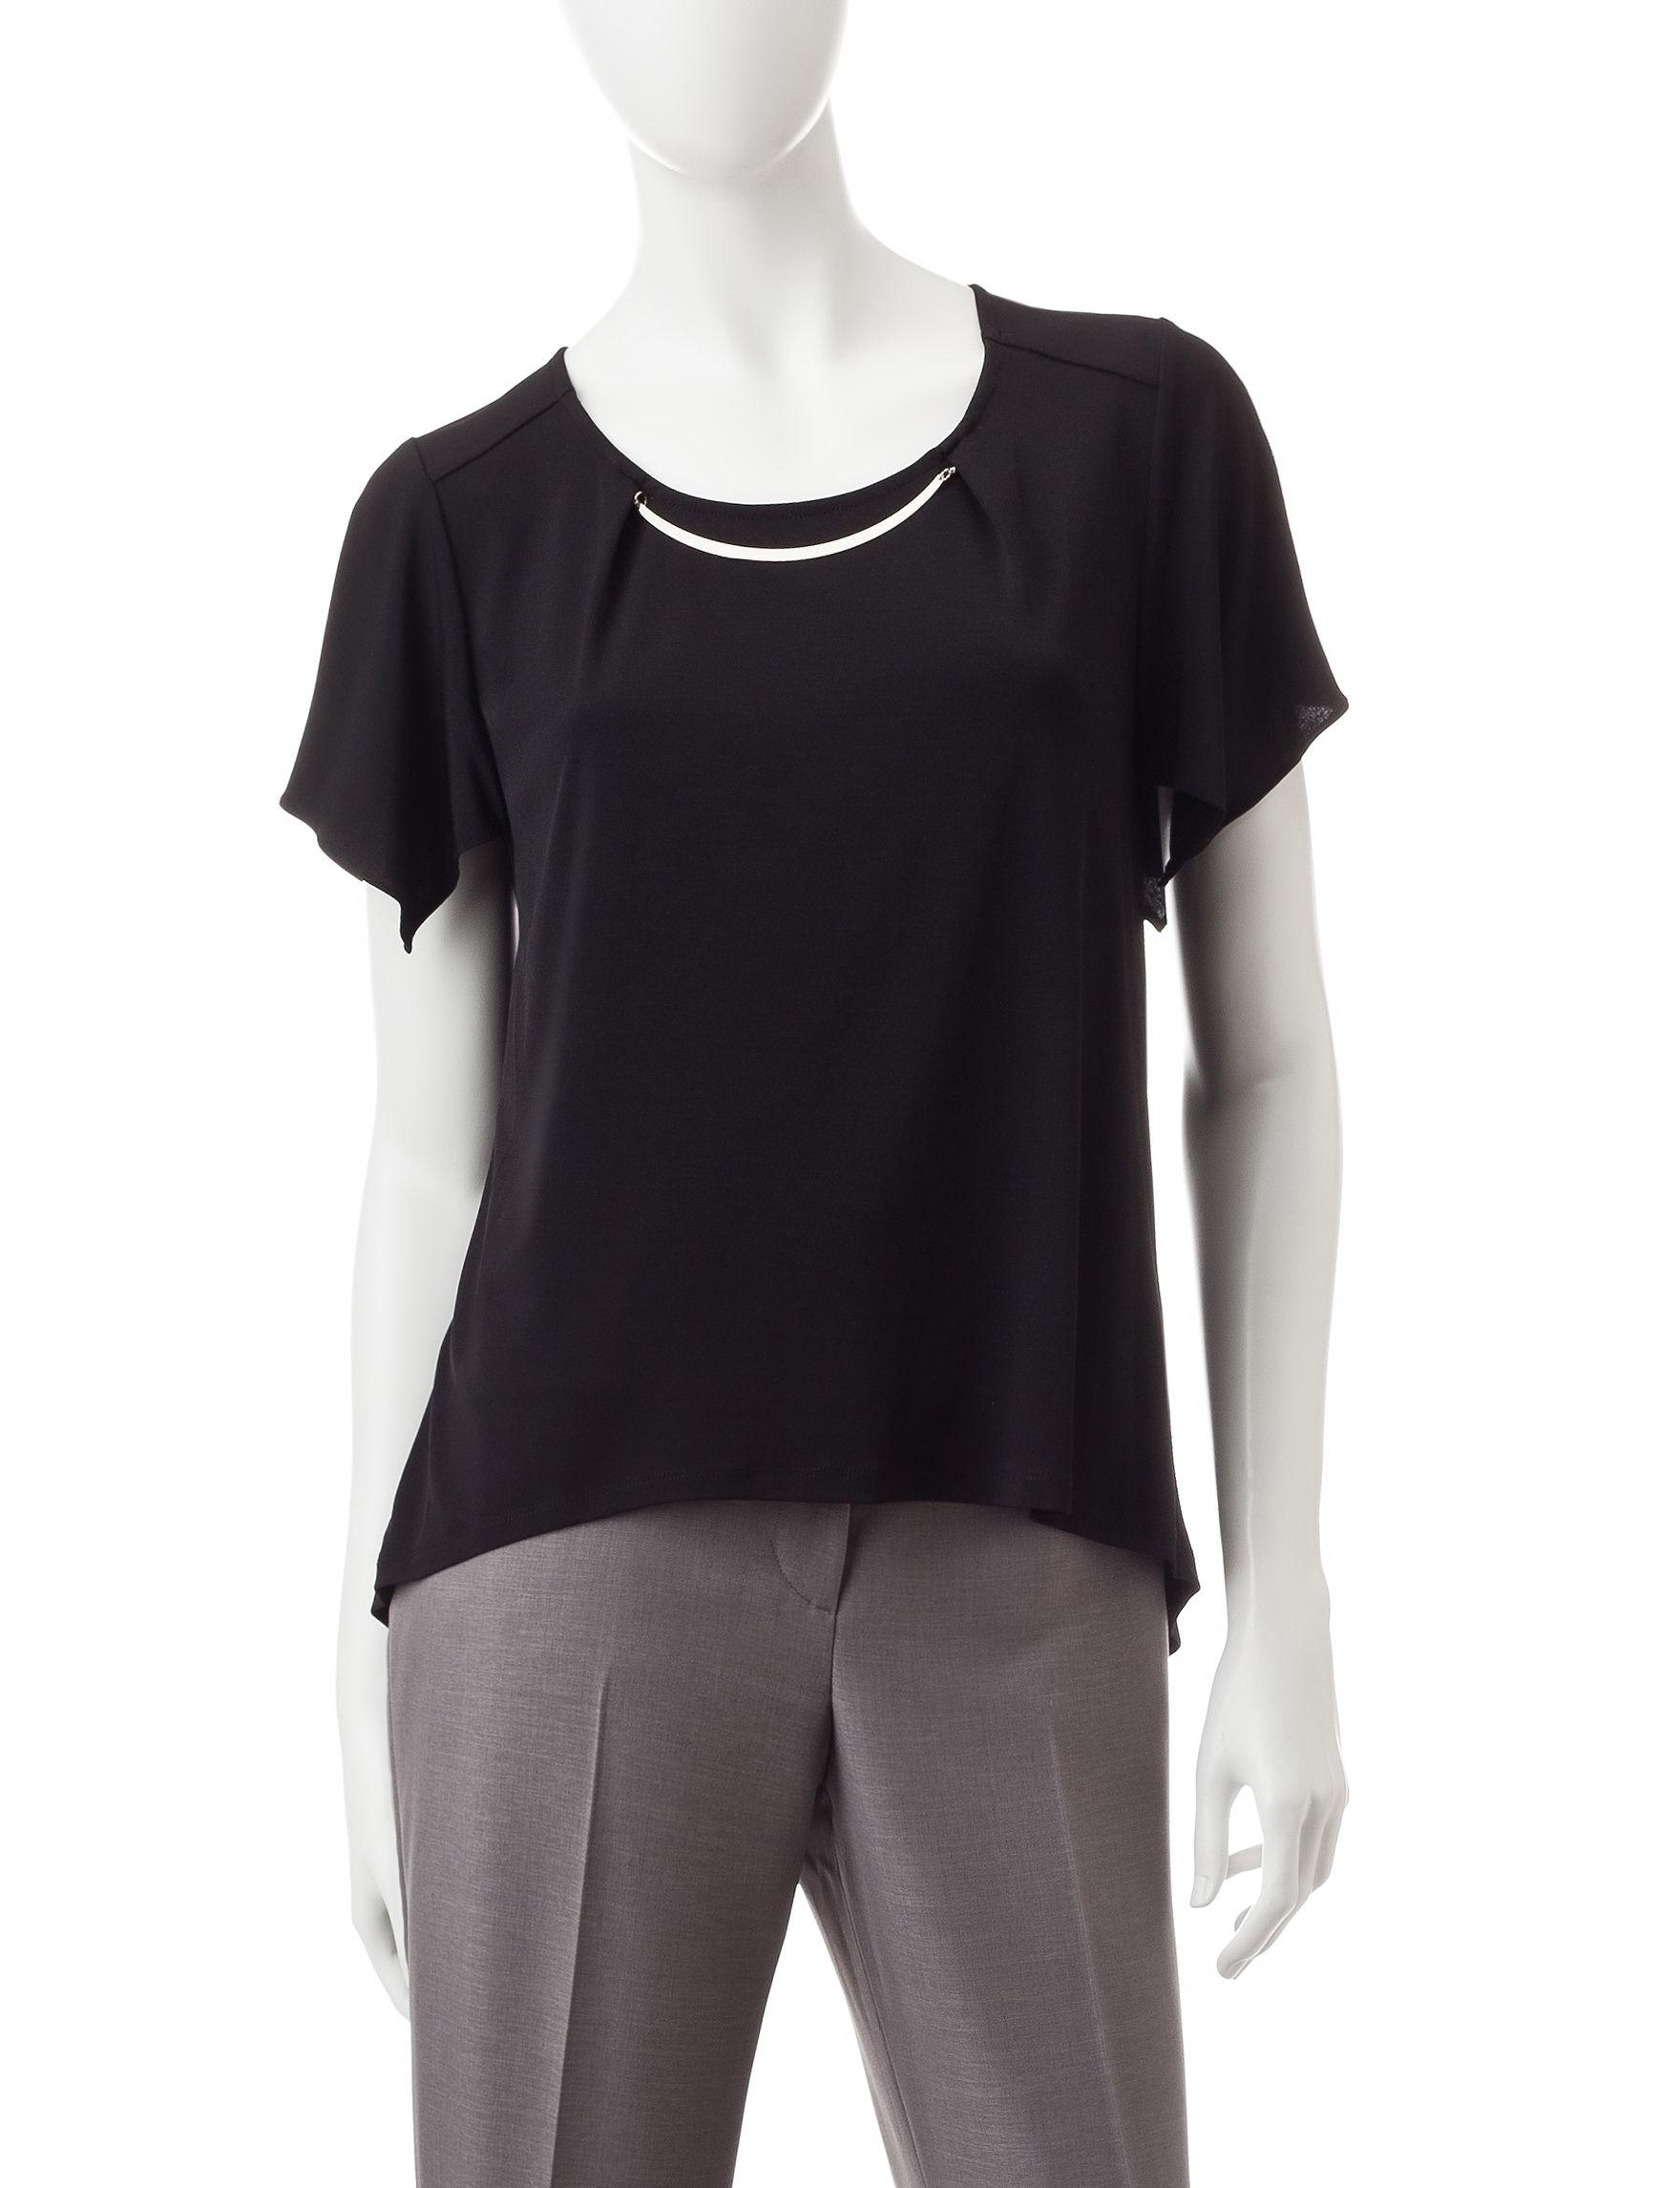 Notations Black Shirts & Blouses